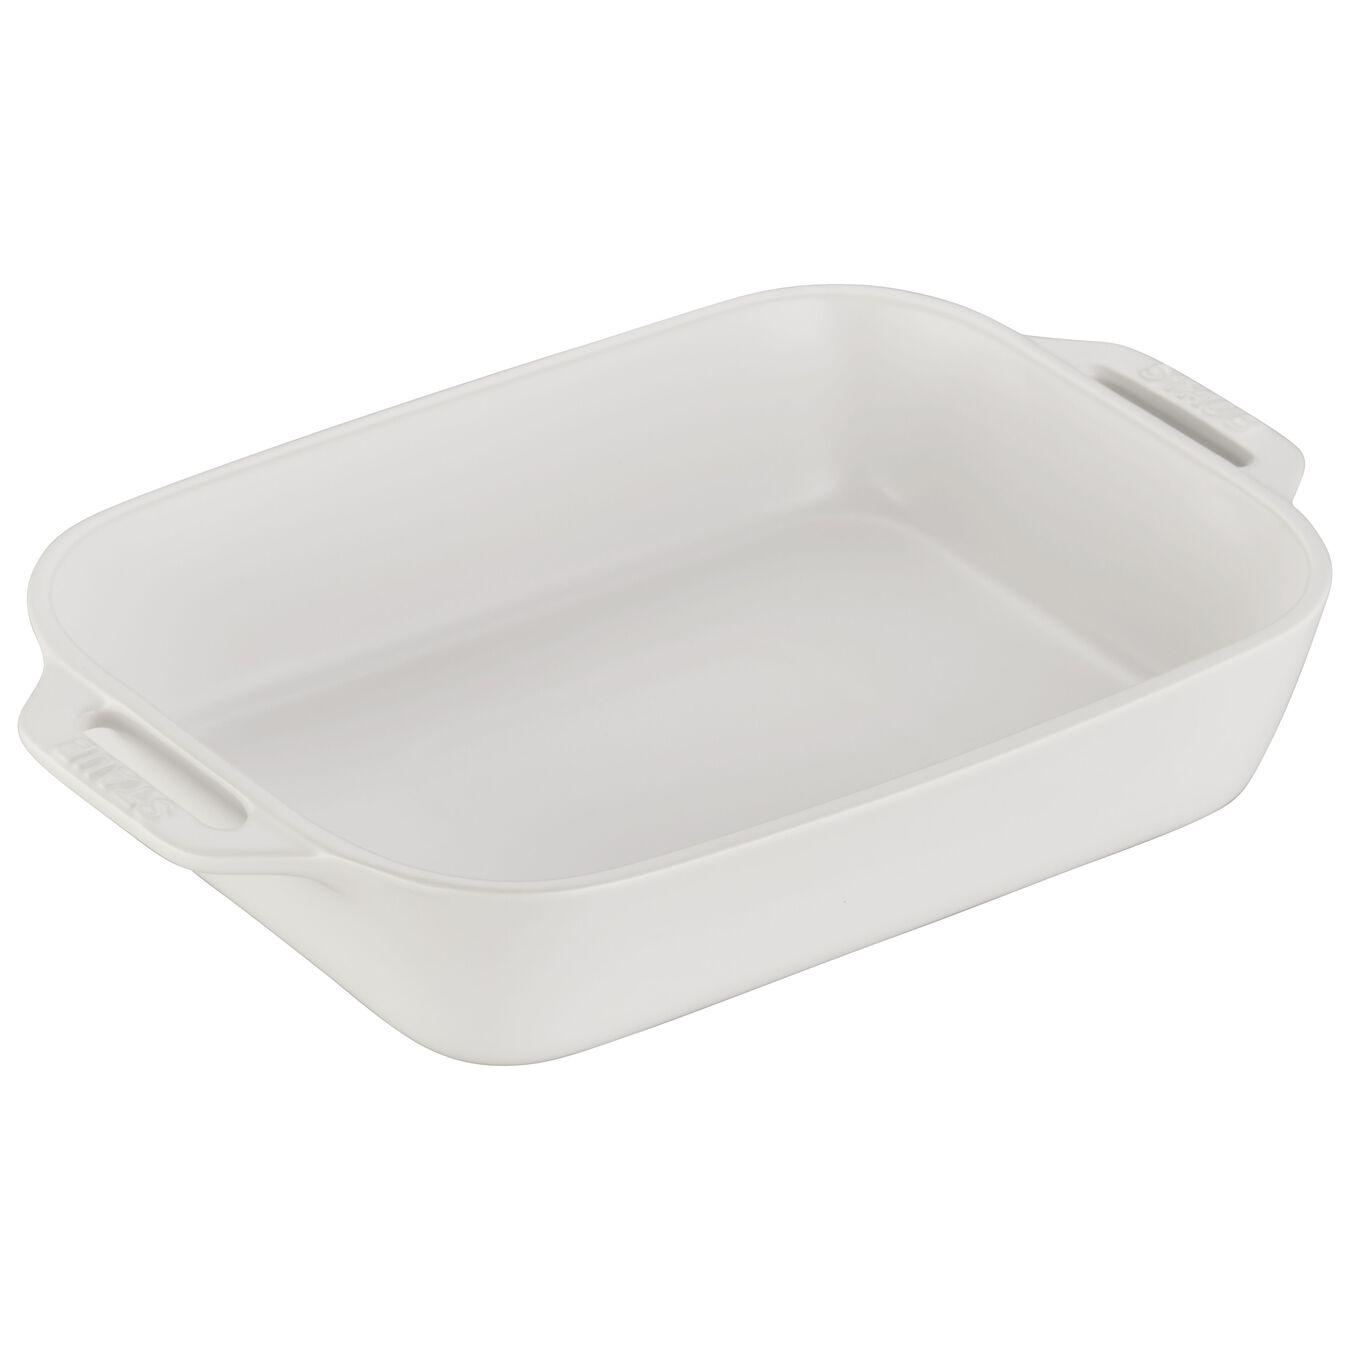 7.87 x 10.75 inch, rectangular, Oven dish, matte white,,large 1